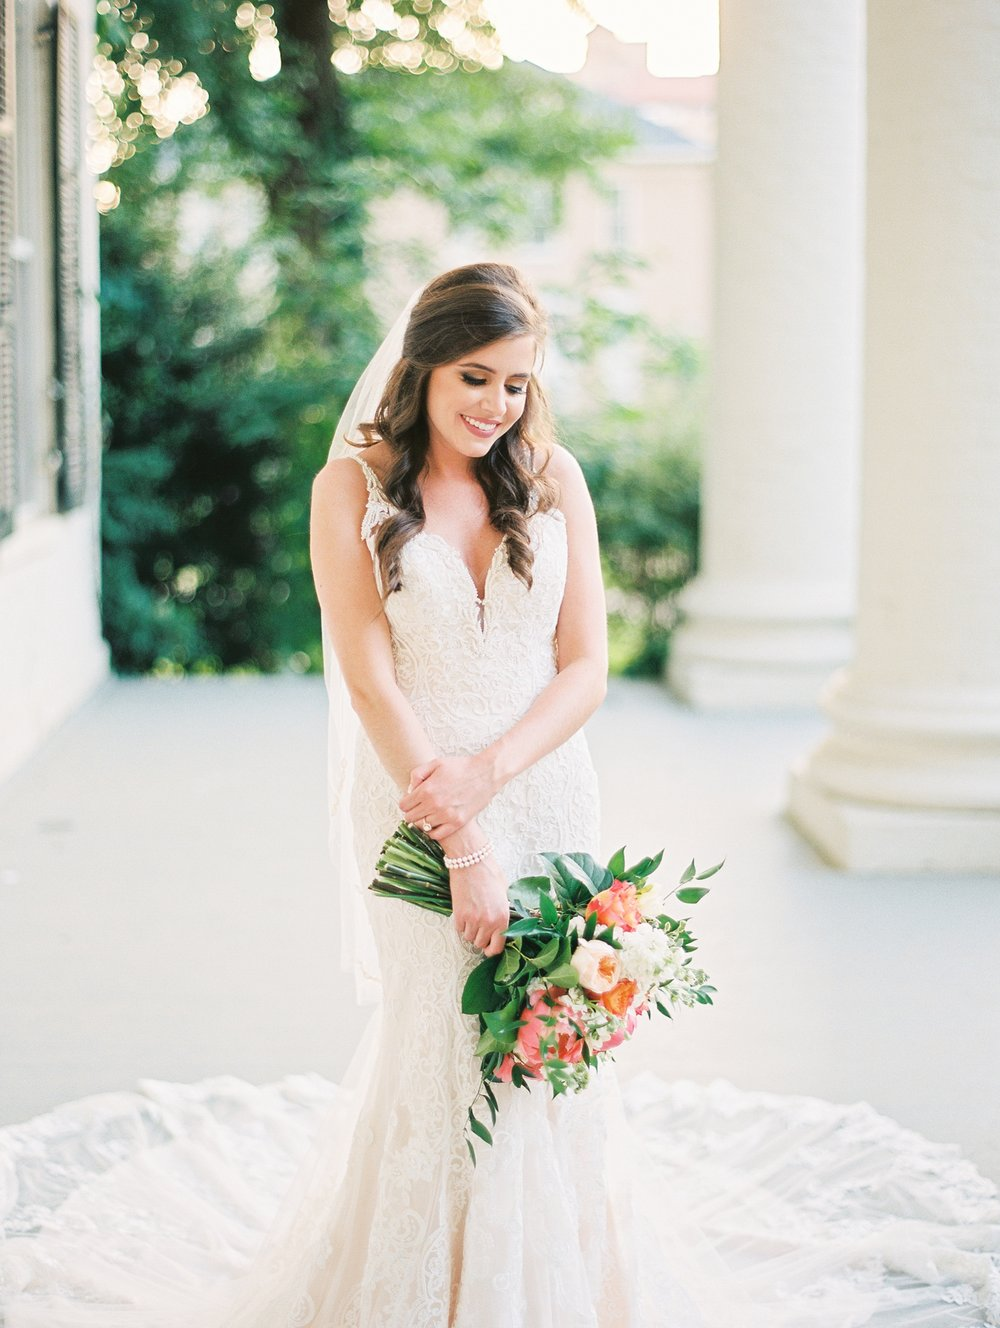 The-Terry-House-Wedding-Little-Rock-Arkansas_0081.jpg